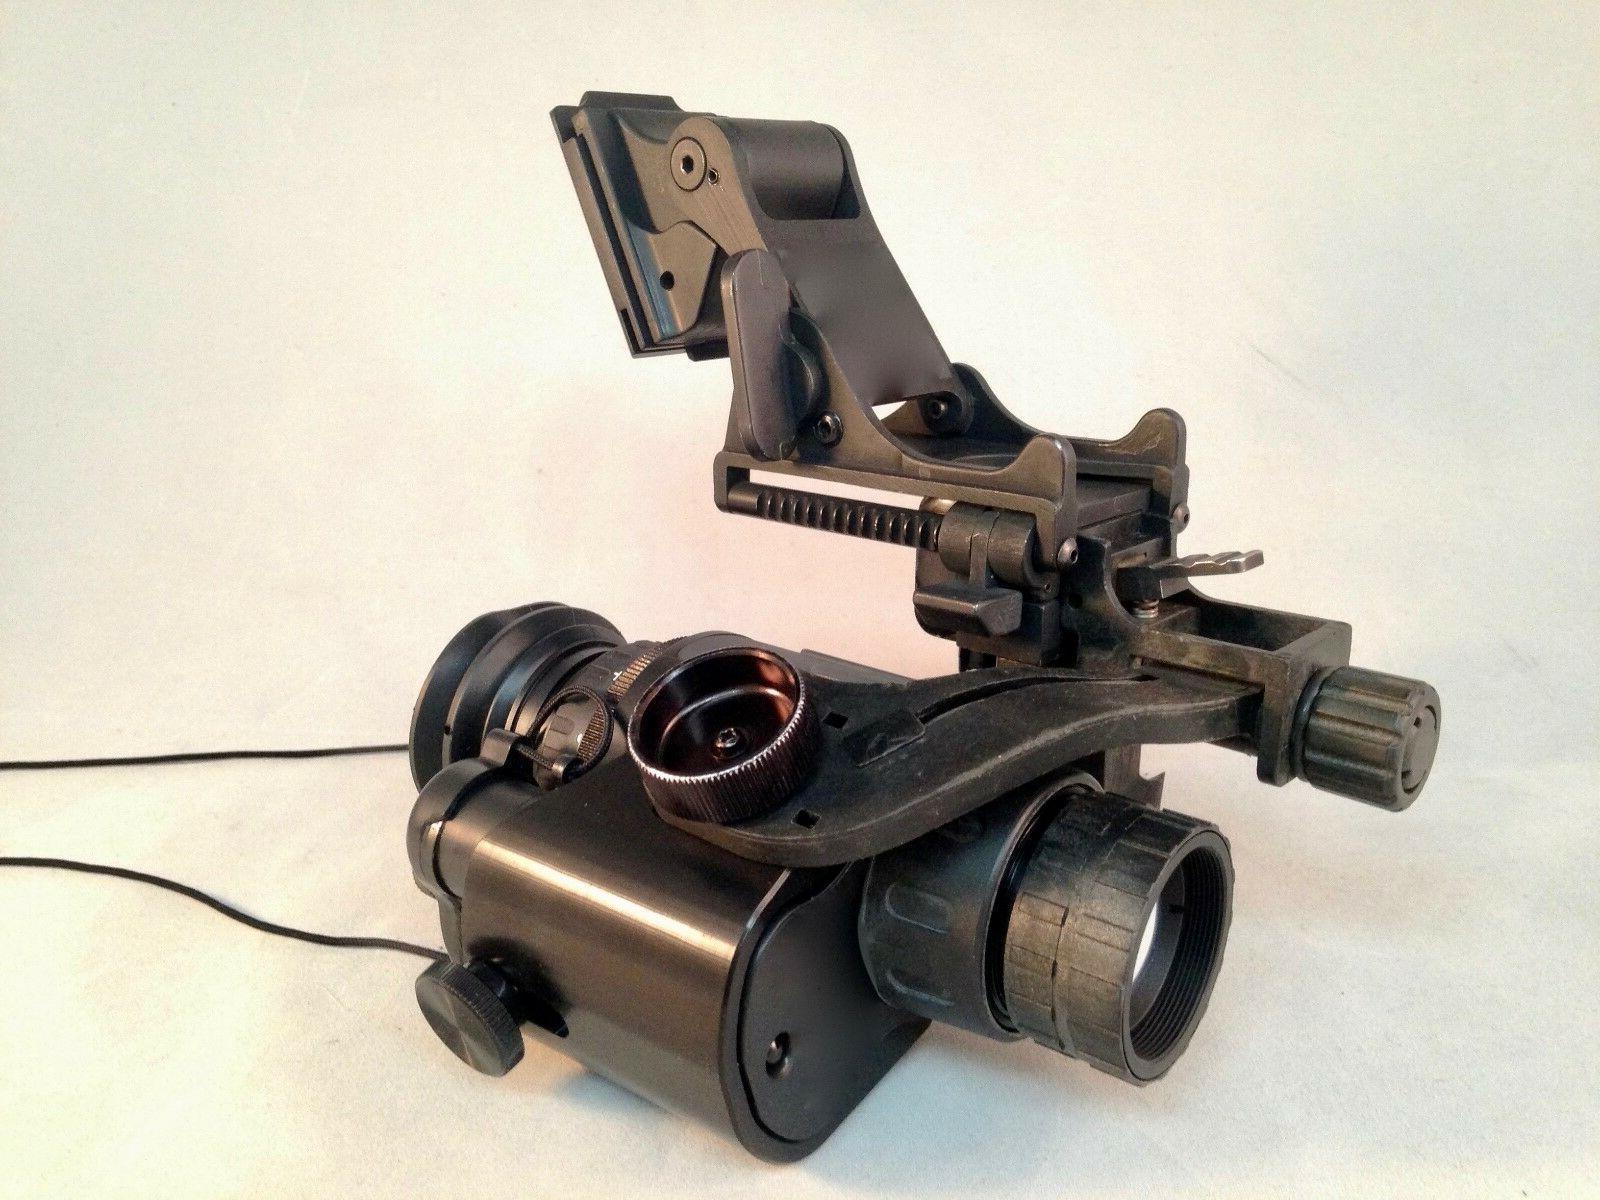 ENVIS Half Shell Mount M703 Night Vision to PVS-14 gear